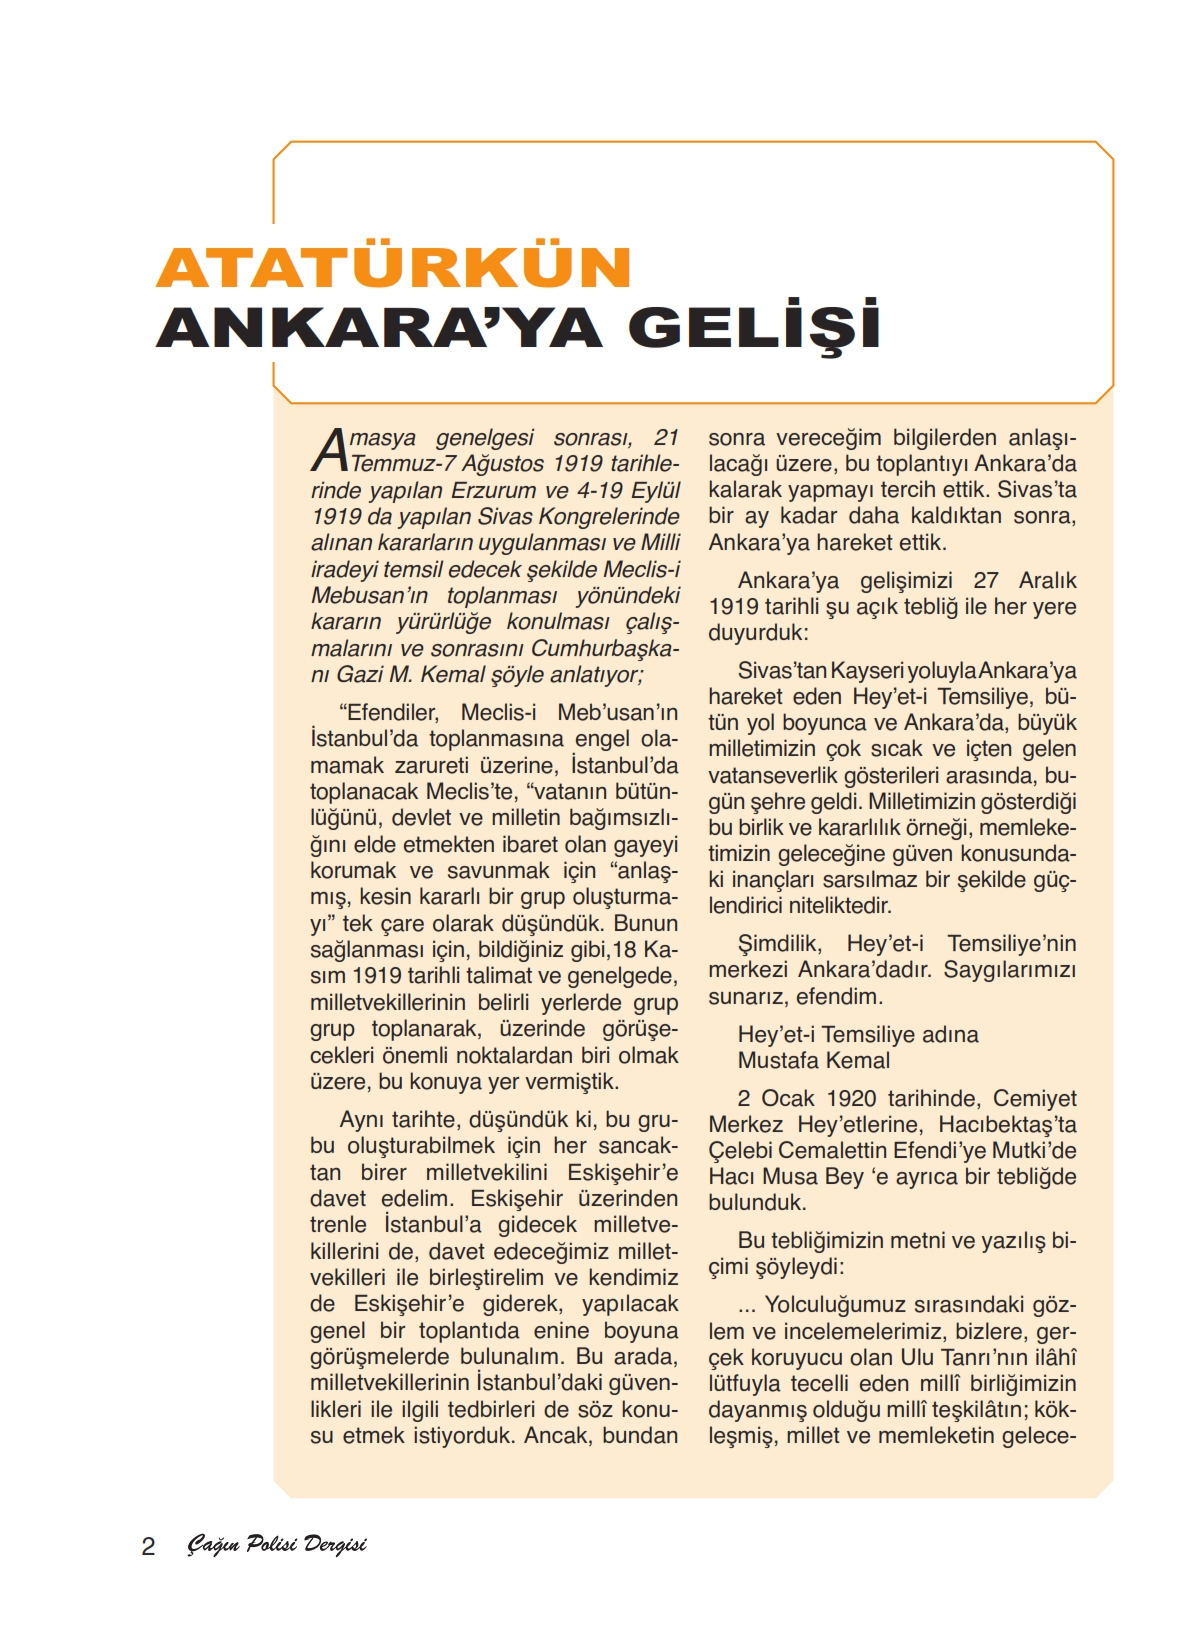 polis_dergi_aralik_2013_int_004